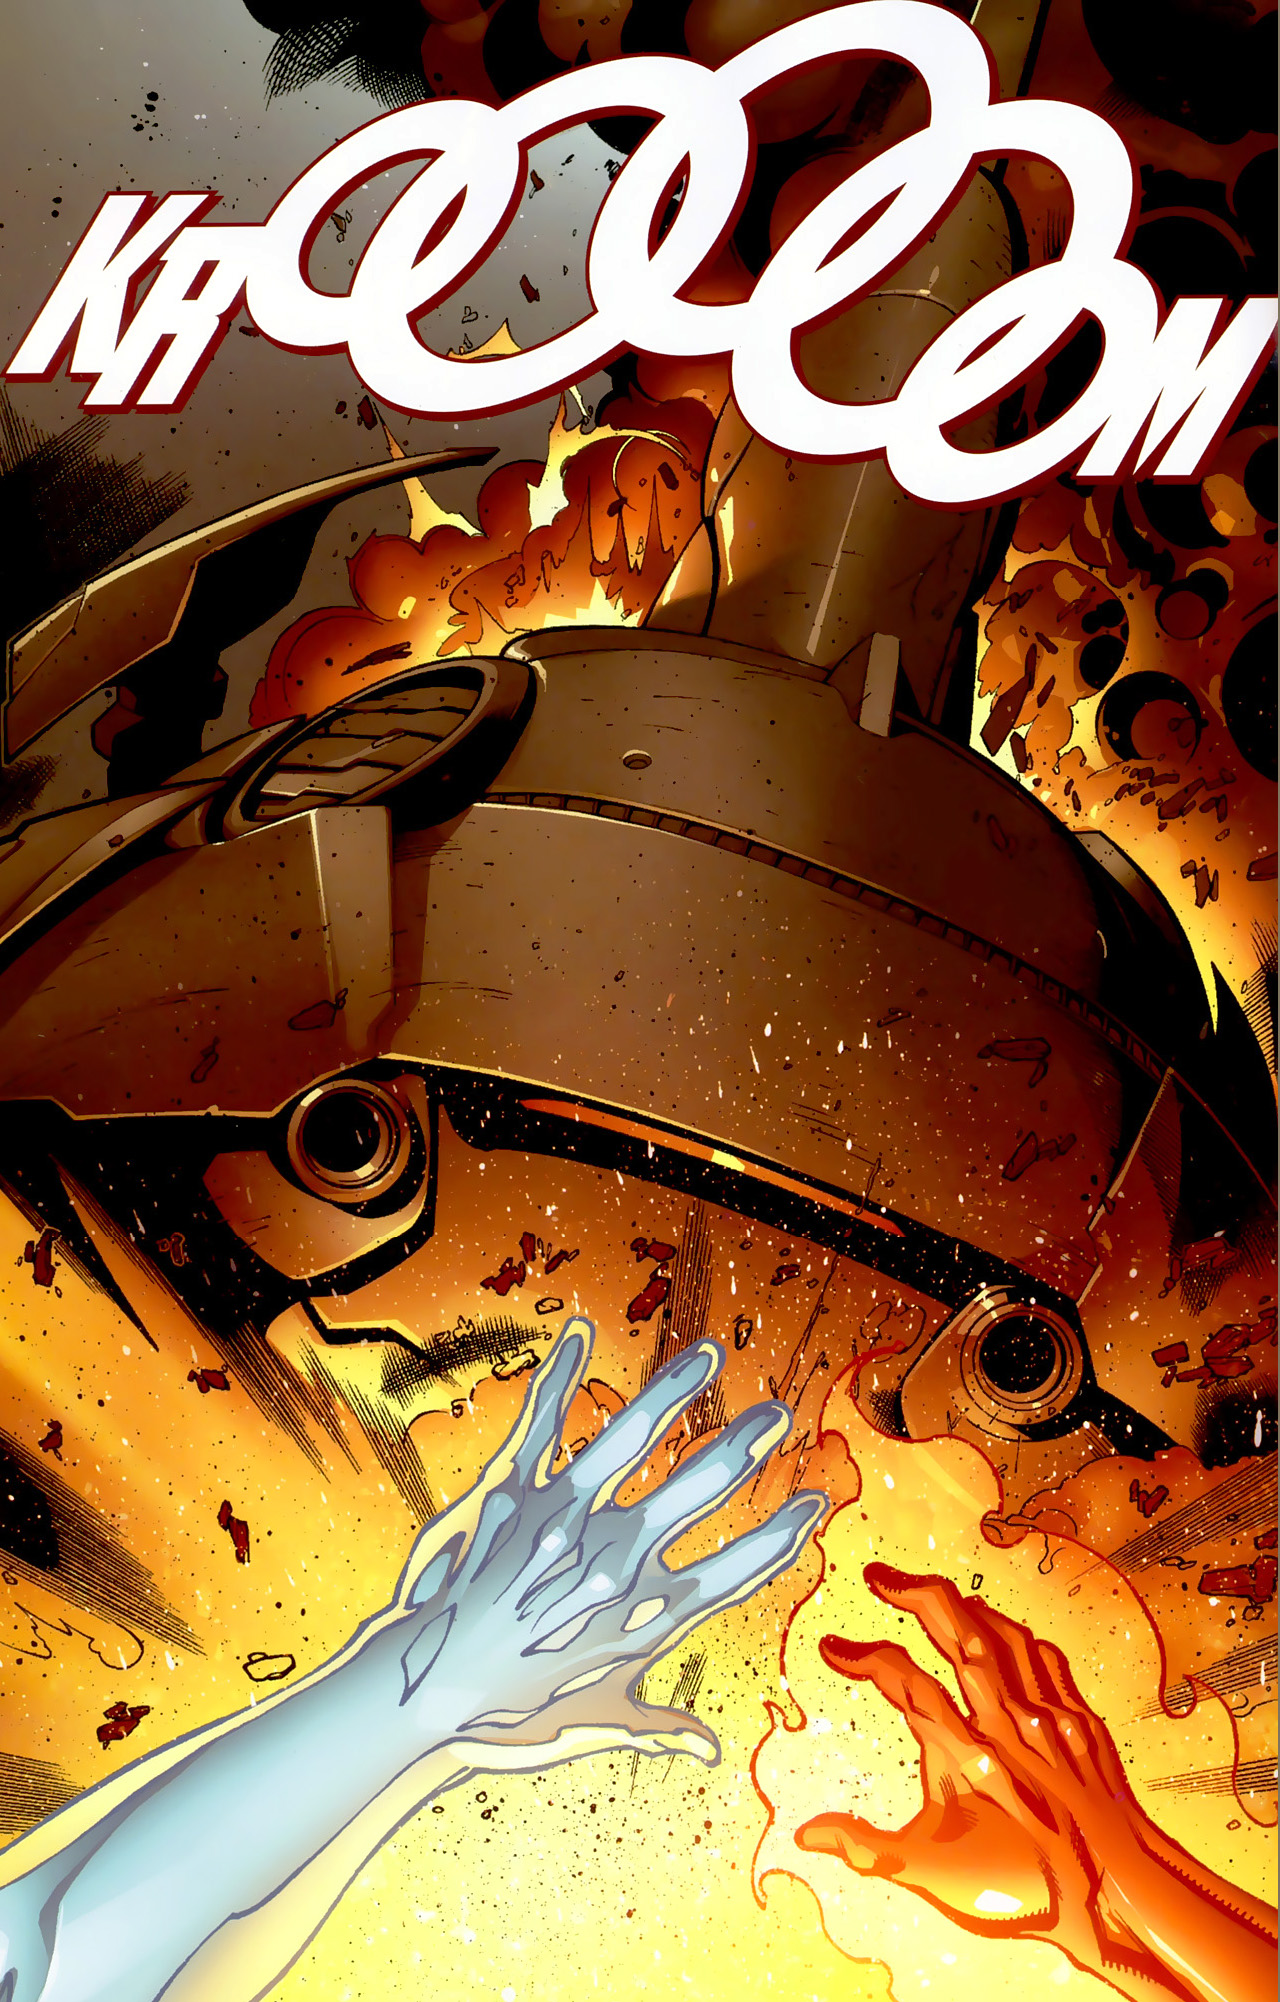 deadpool takes down a skrull ship